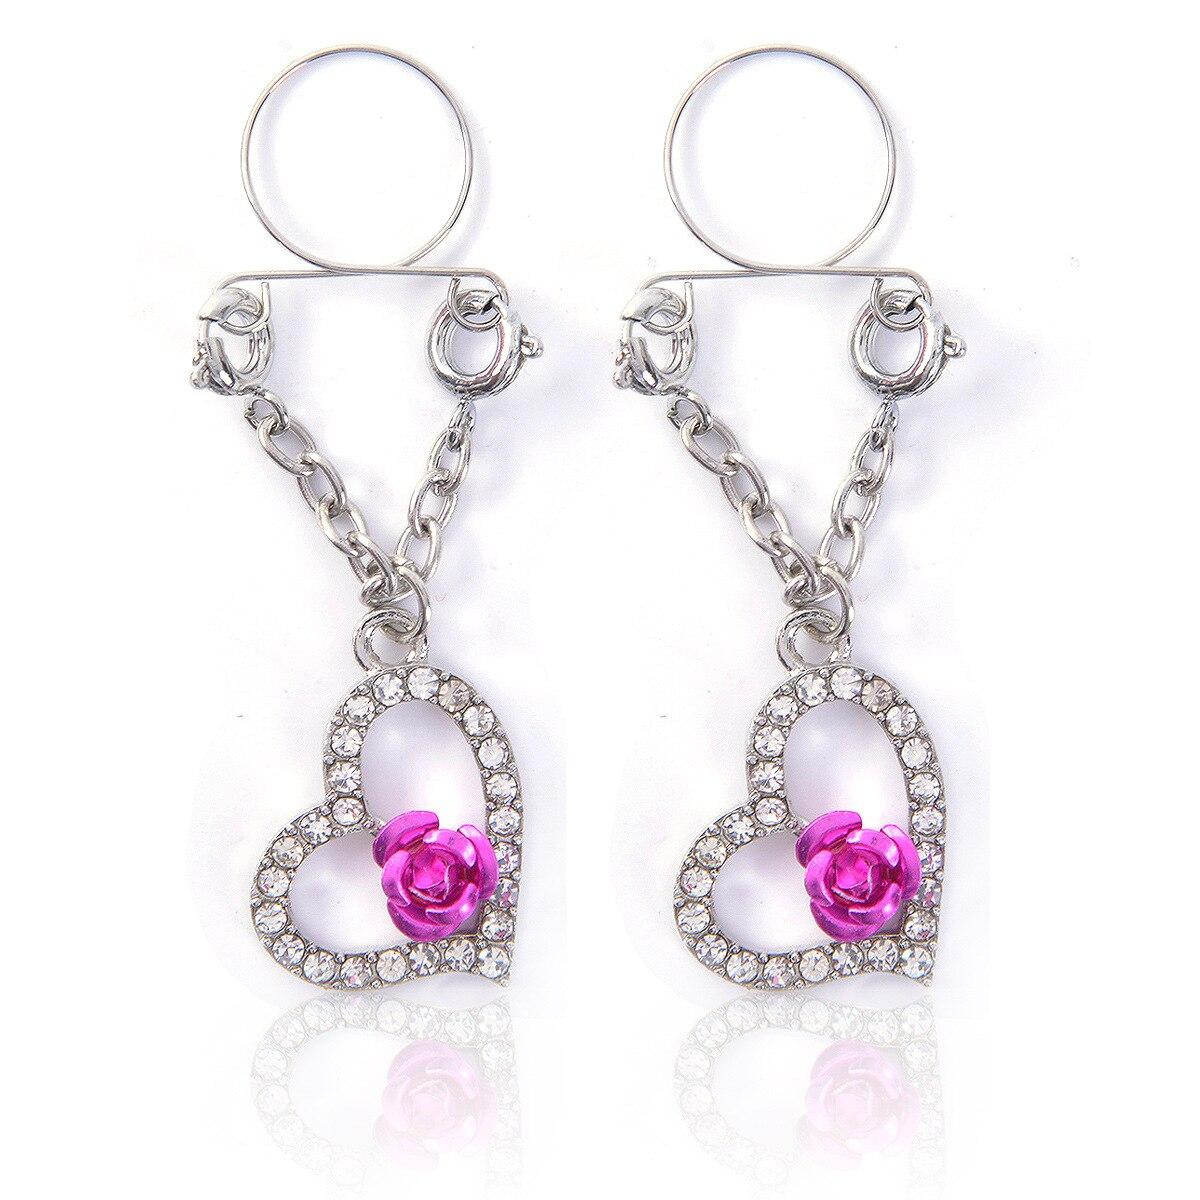 1 par de anillos de pecho de acero inoxidable sección de explosión colgante de corazón Rosa anillo de pecho falso Piercing de pezón ajustable joyería